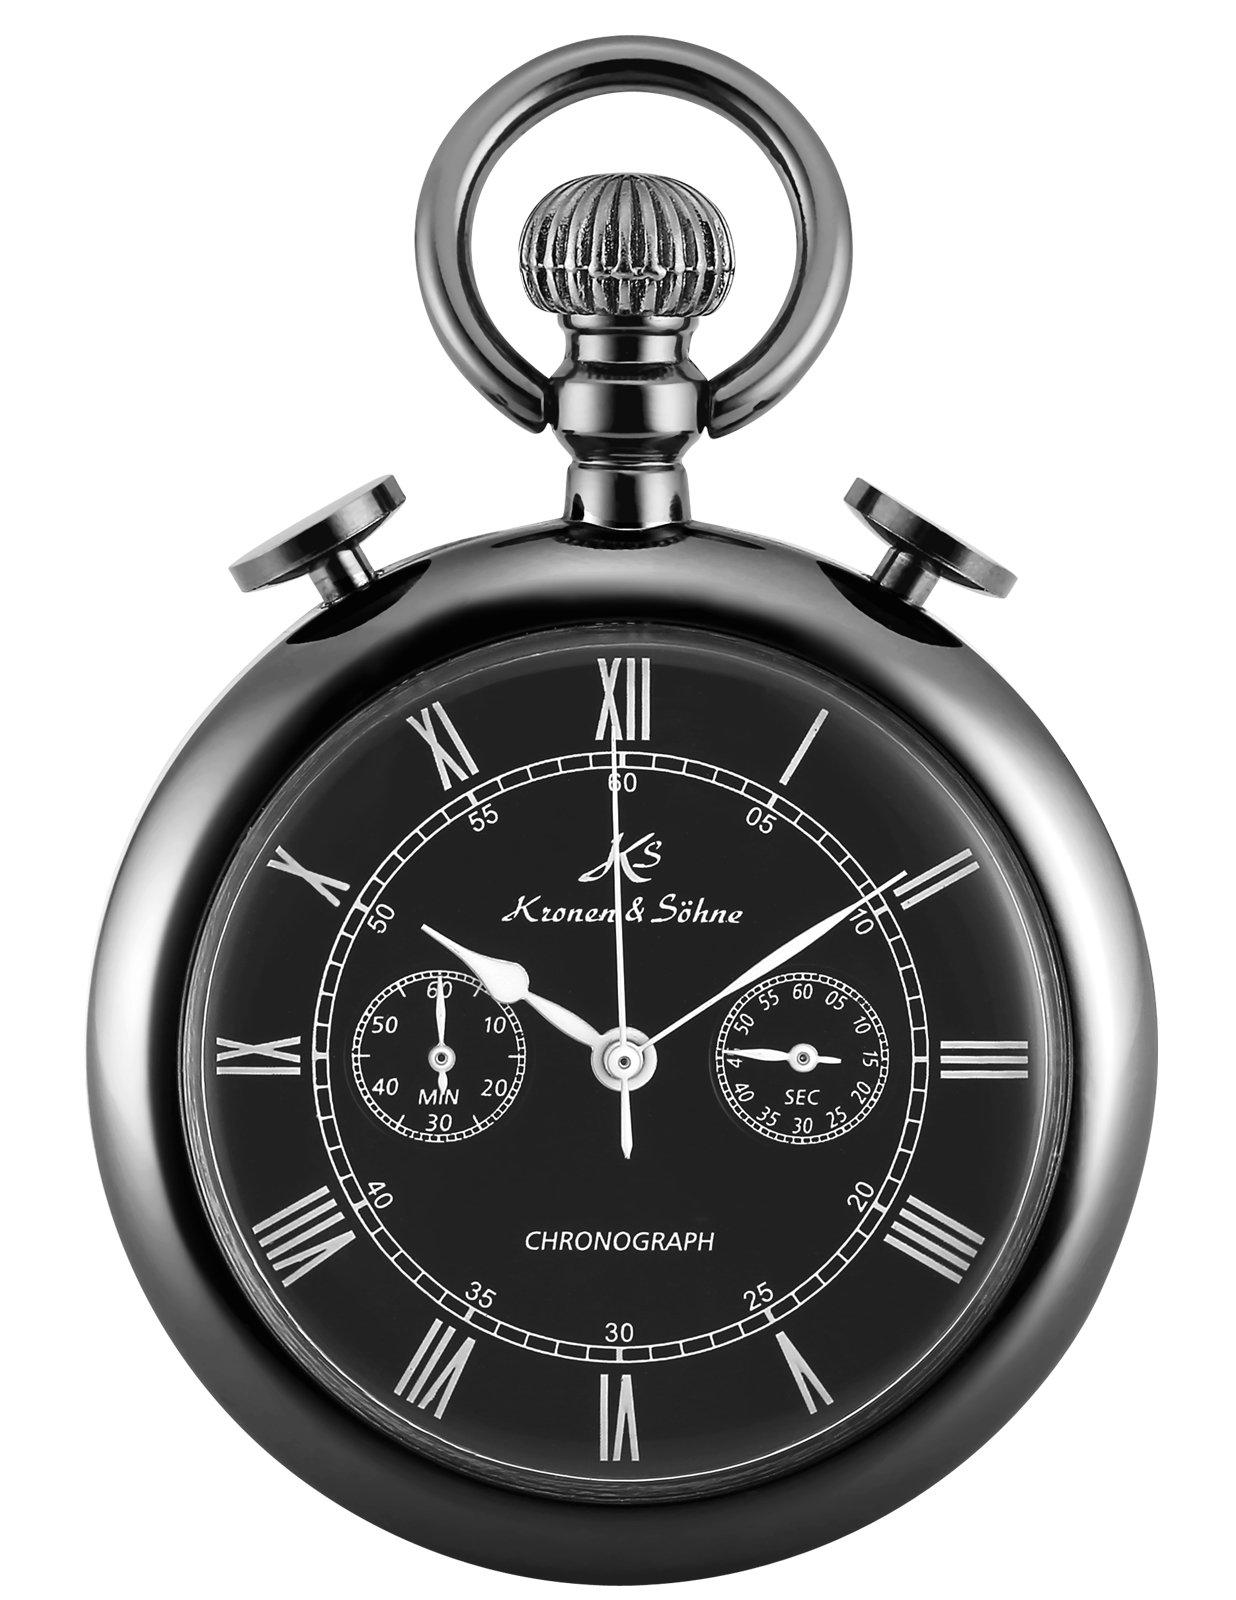 KS Classic Roman Numerals Markers Chronograph Function Quartz Pocket Watch KSP093